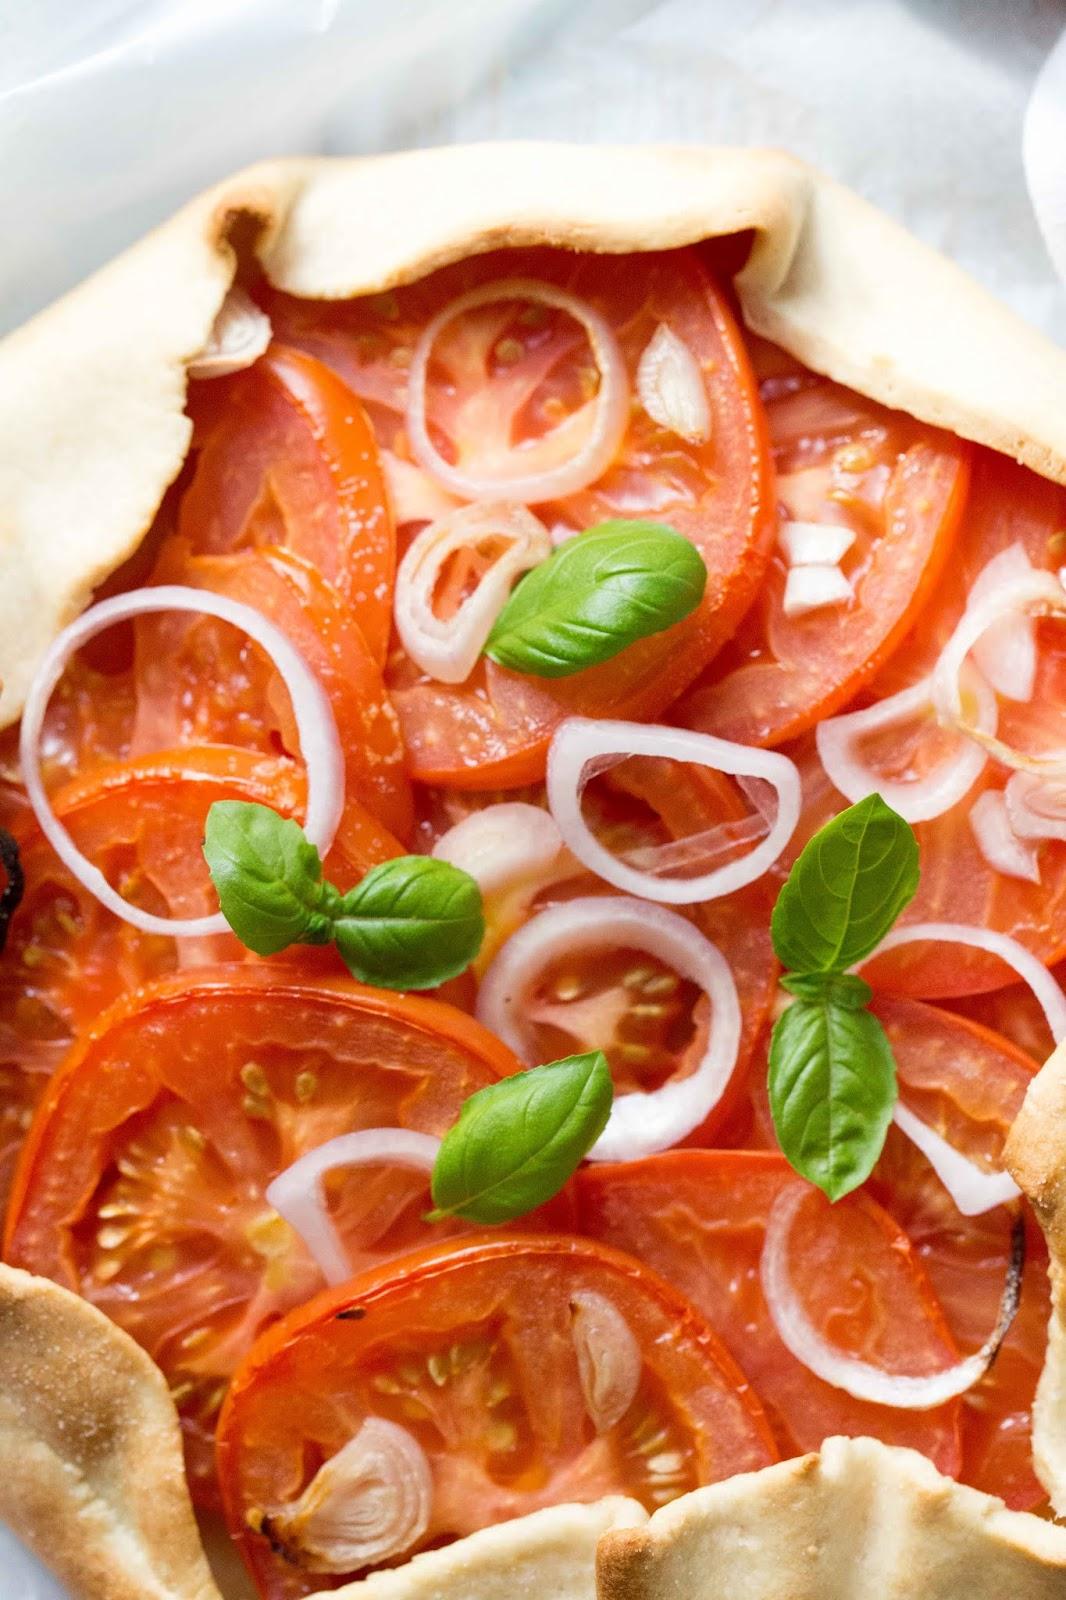 Receta facil de galette de tomates